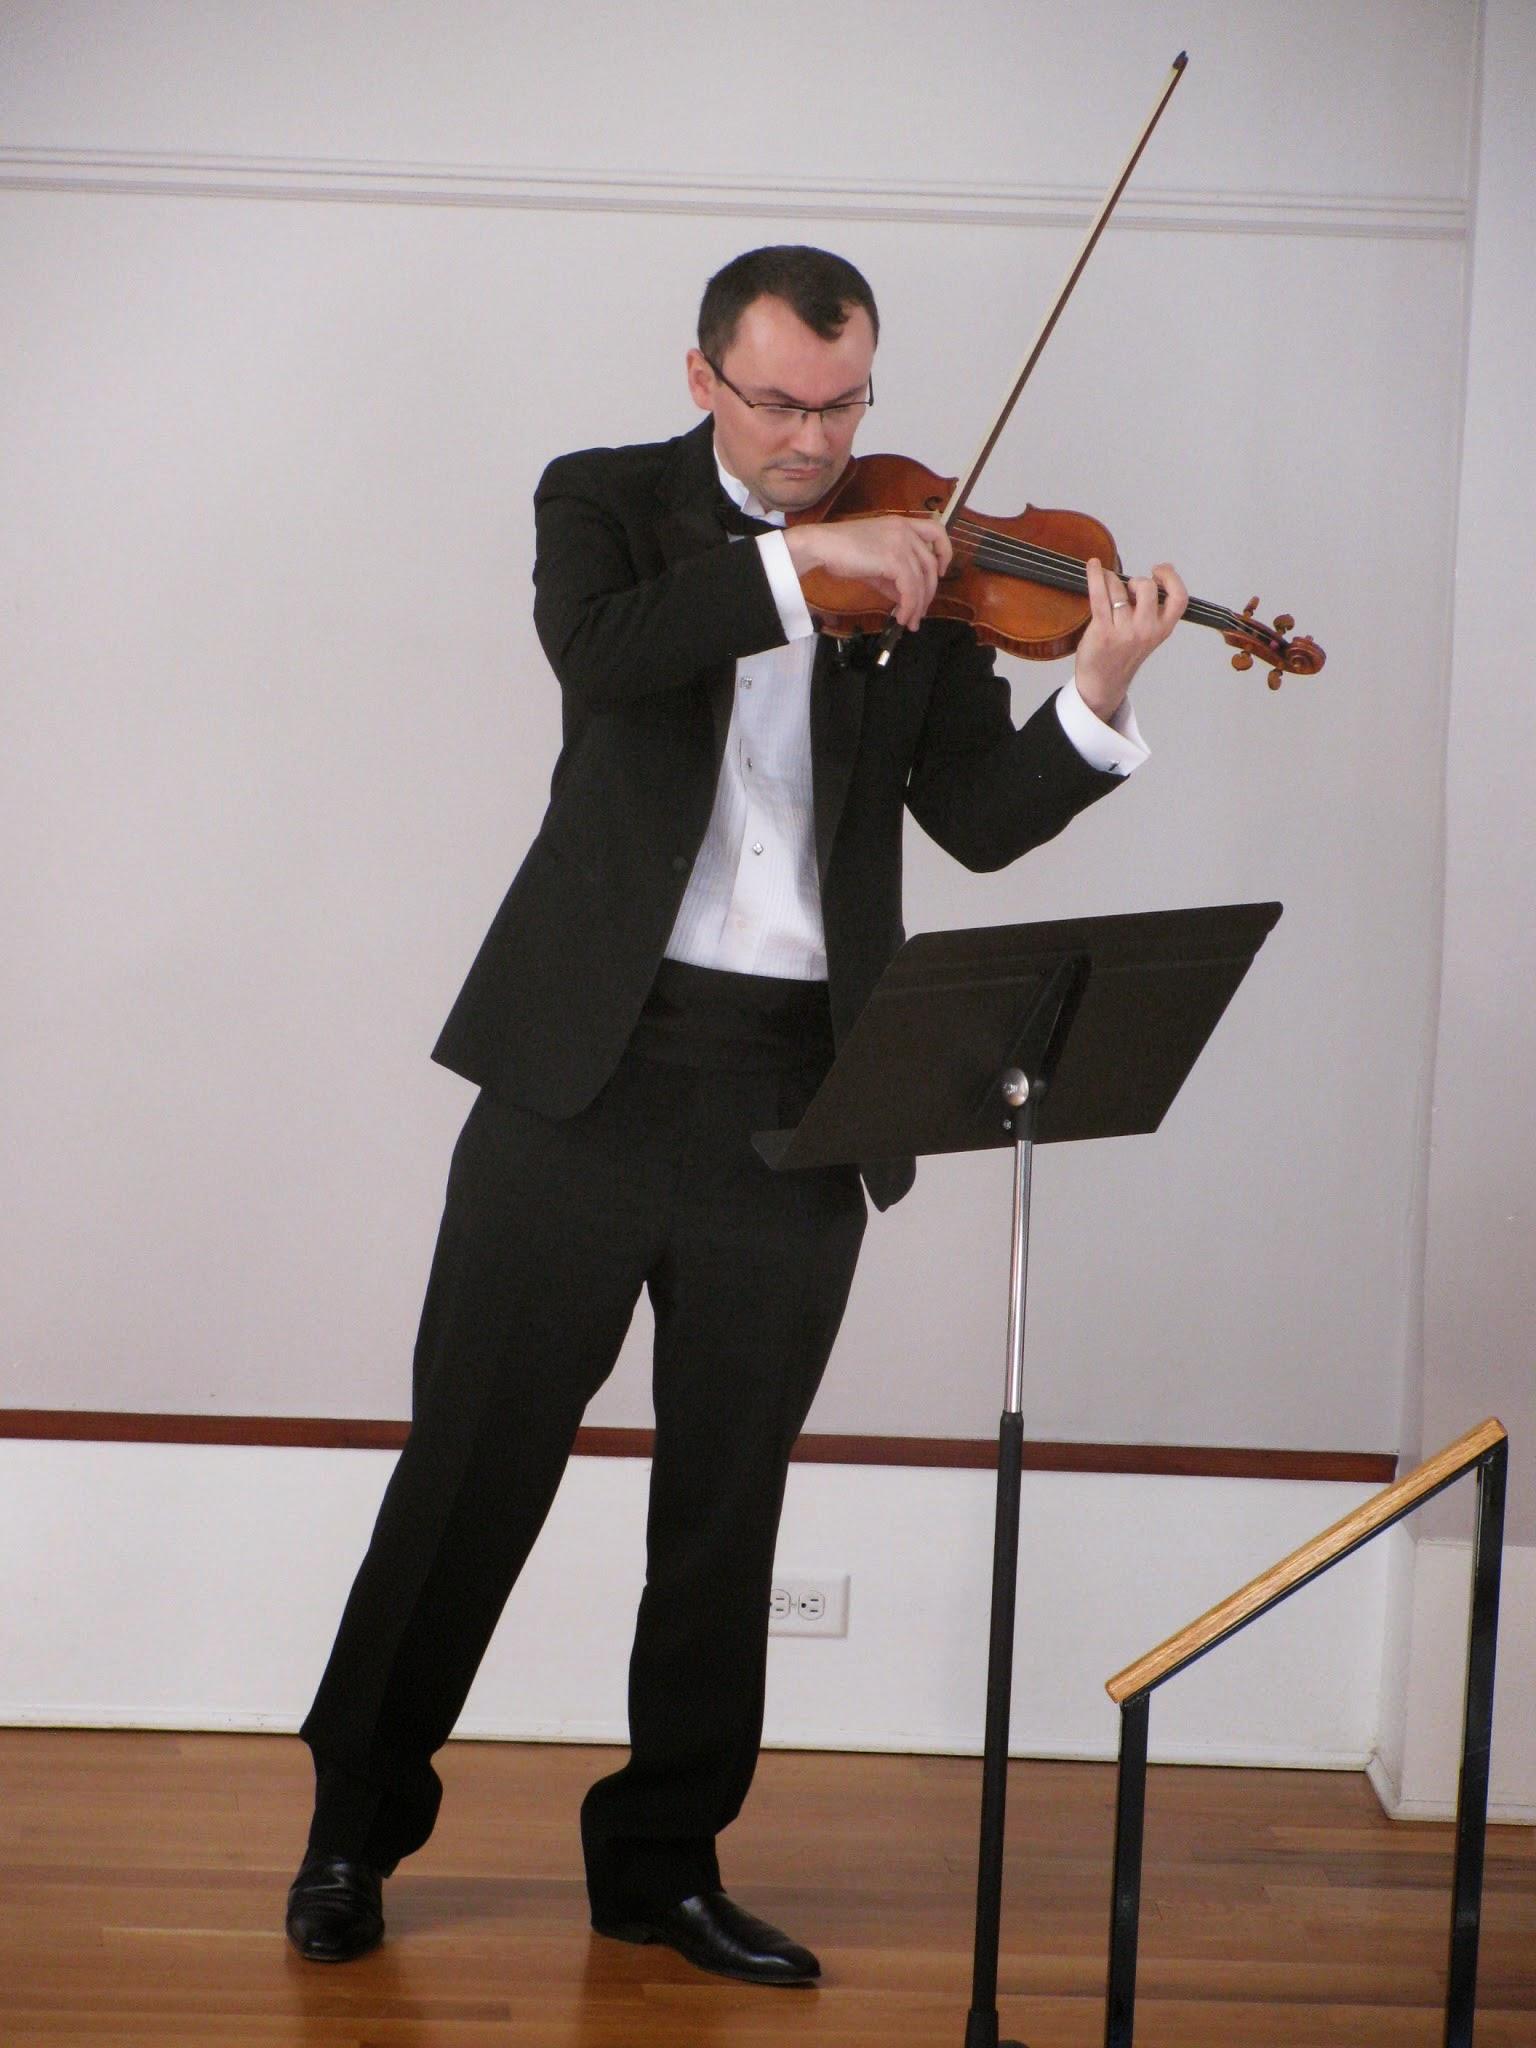 Special Guest Violinist Dan Flonta